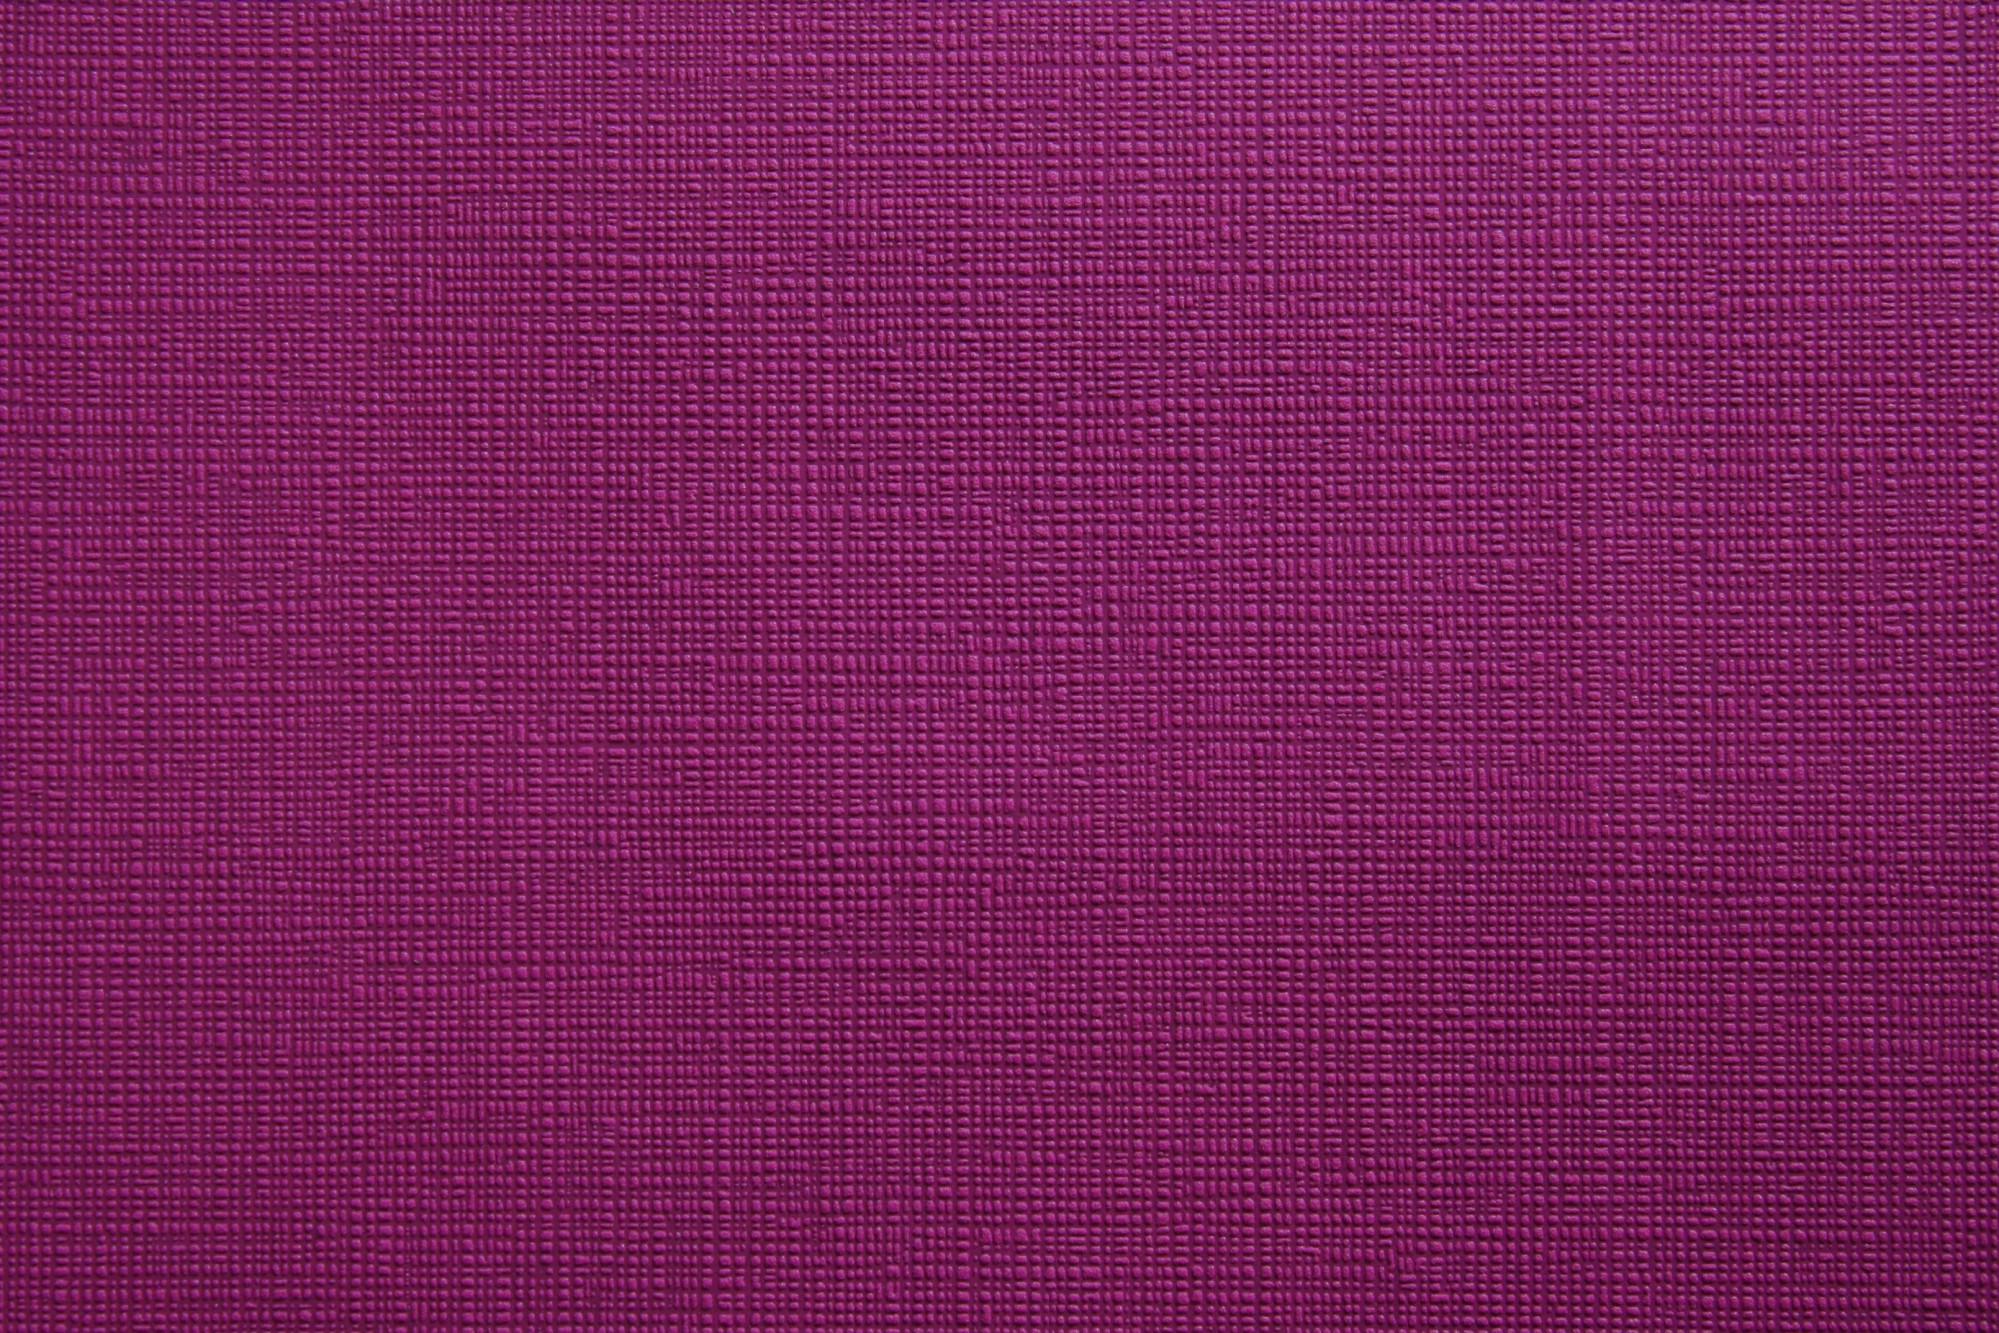 tapete esprit 7 vliestapete uni 2661 49 266149 lila. Black Bedroom Furniture Sets. Home Design Ideas